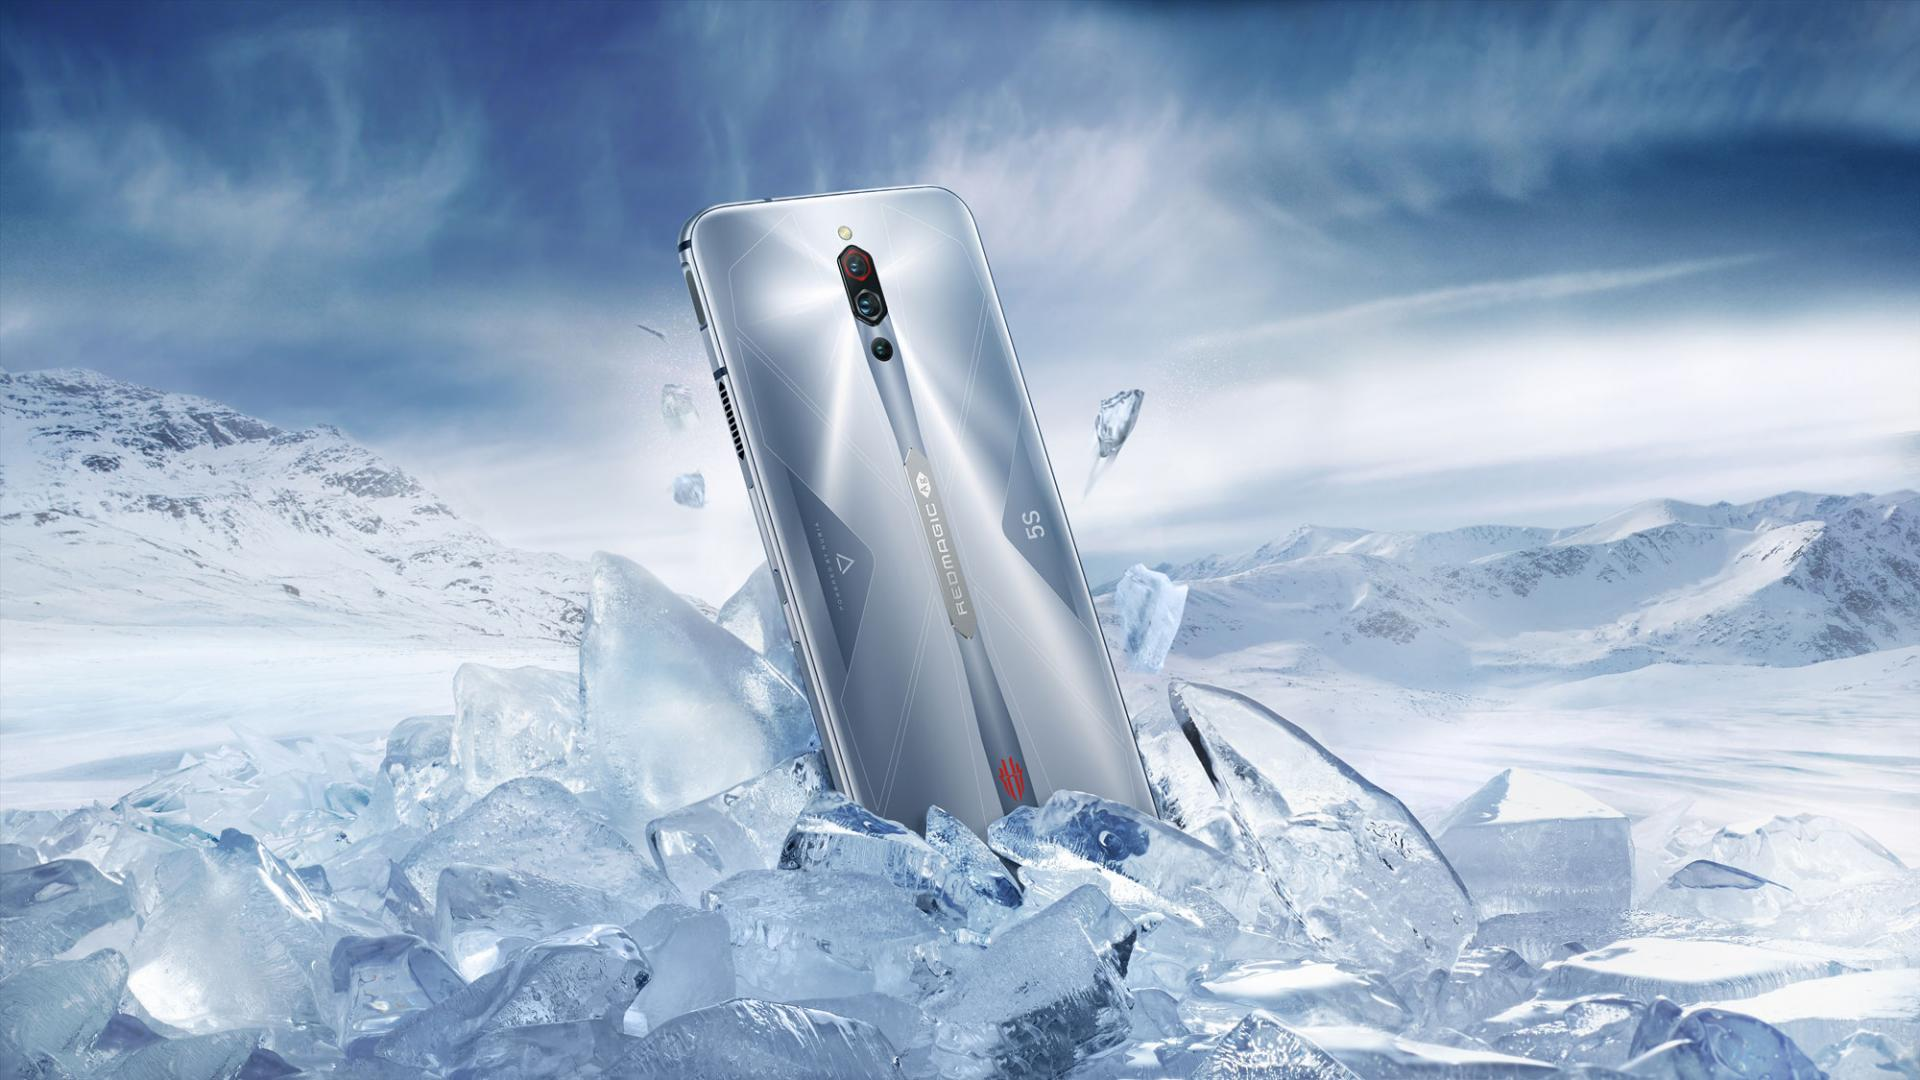 Смартфон RedMagic 5s отZTE: специальная цена иподарки для покупателей